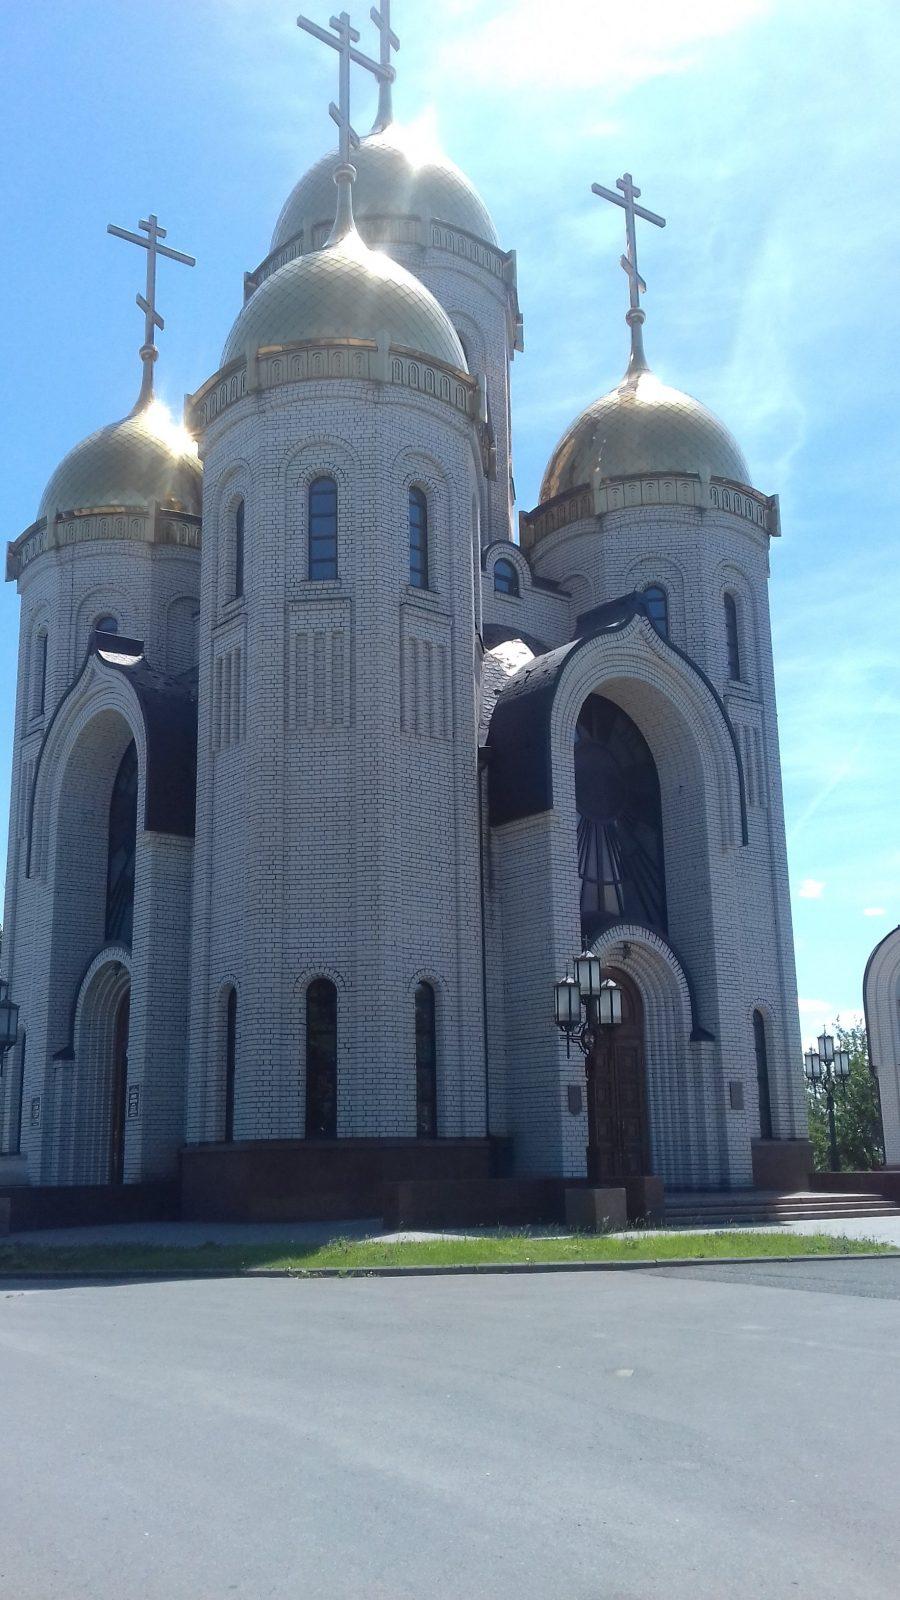 20180610 171546 e1556338485431 - Прогулка по Волгограду